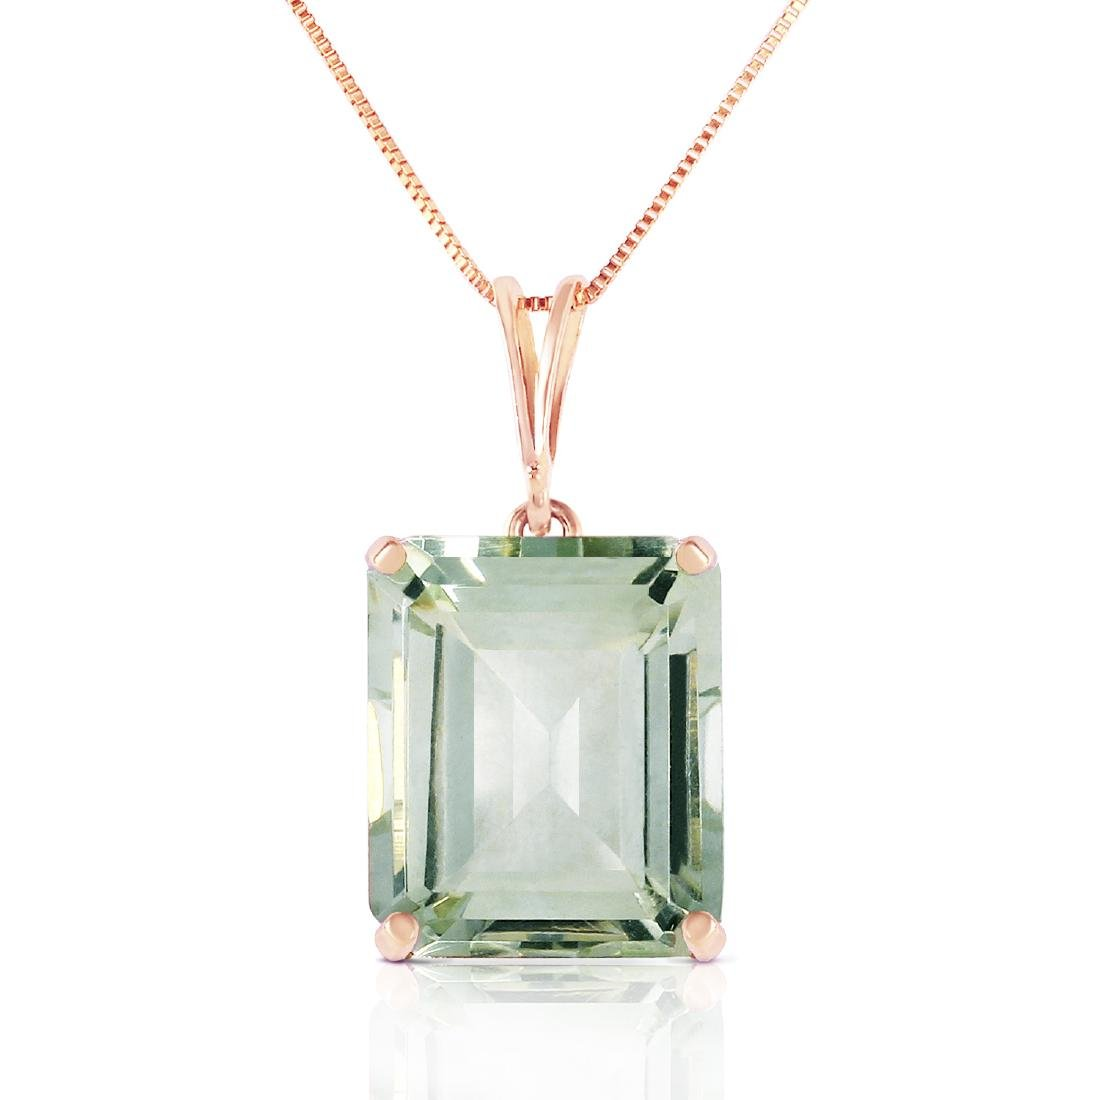 Genuine 6.5 ctw Green Amethyst Necklace Jewelry 14KT